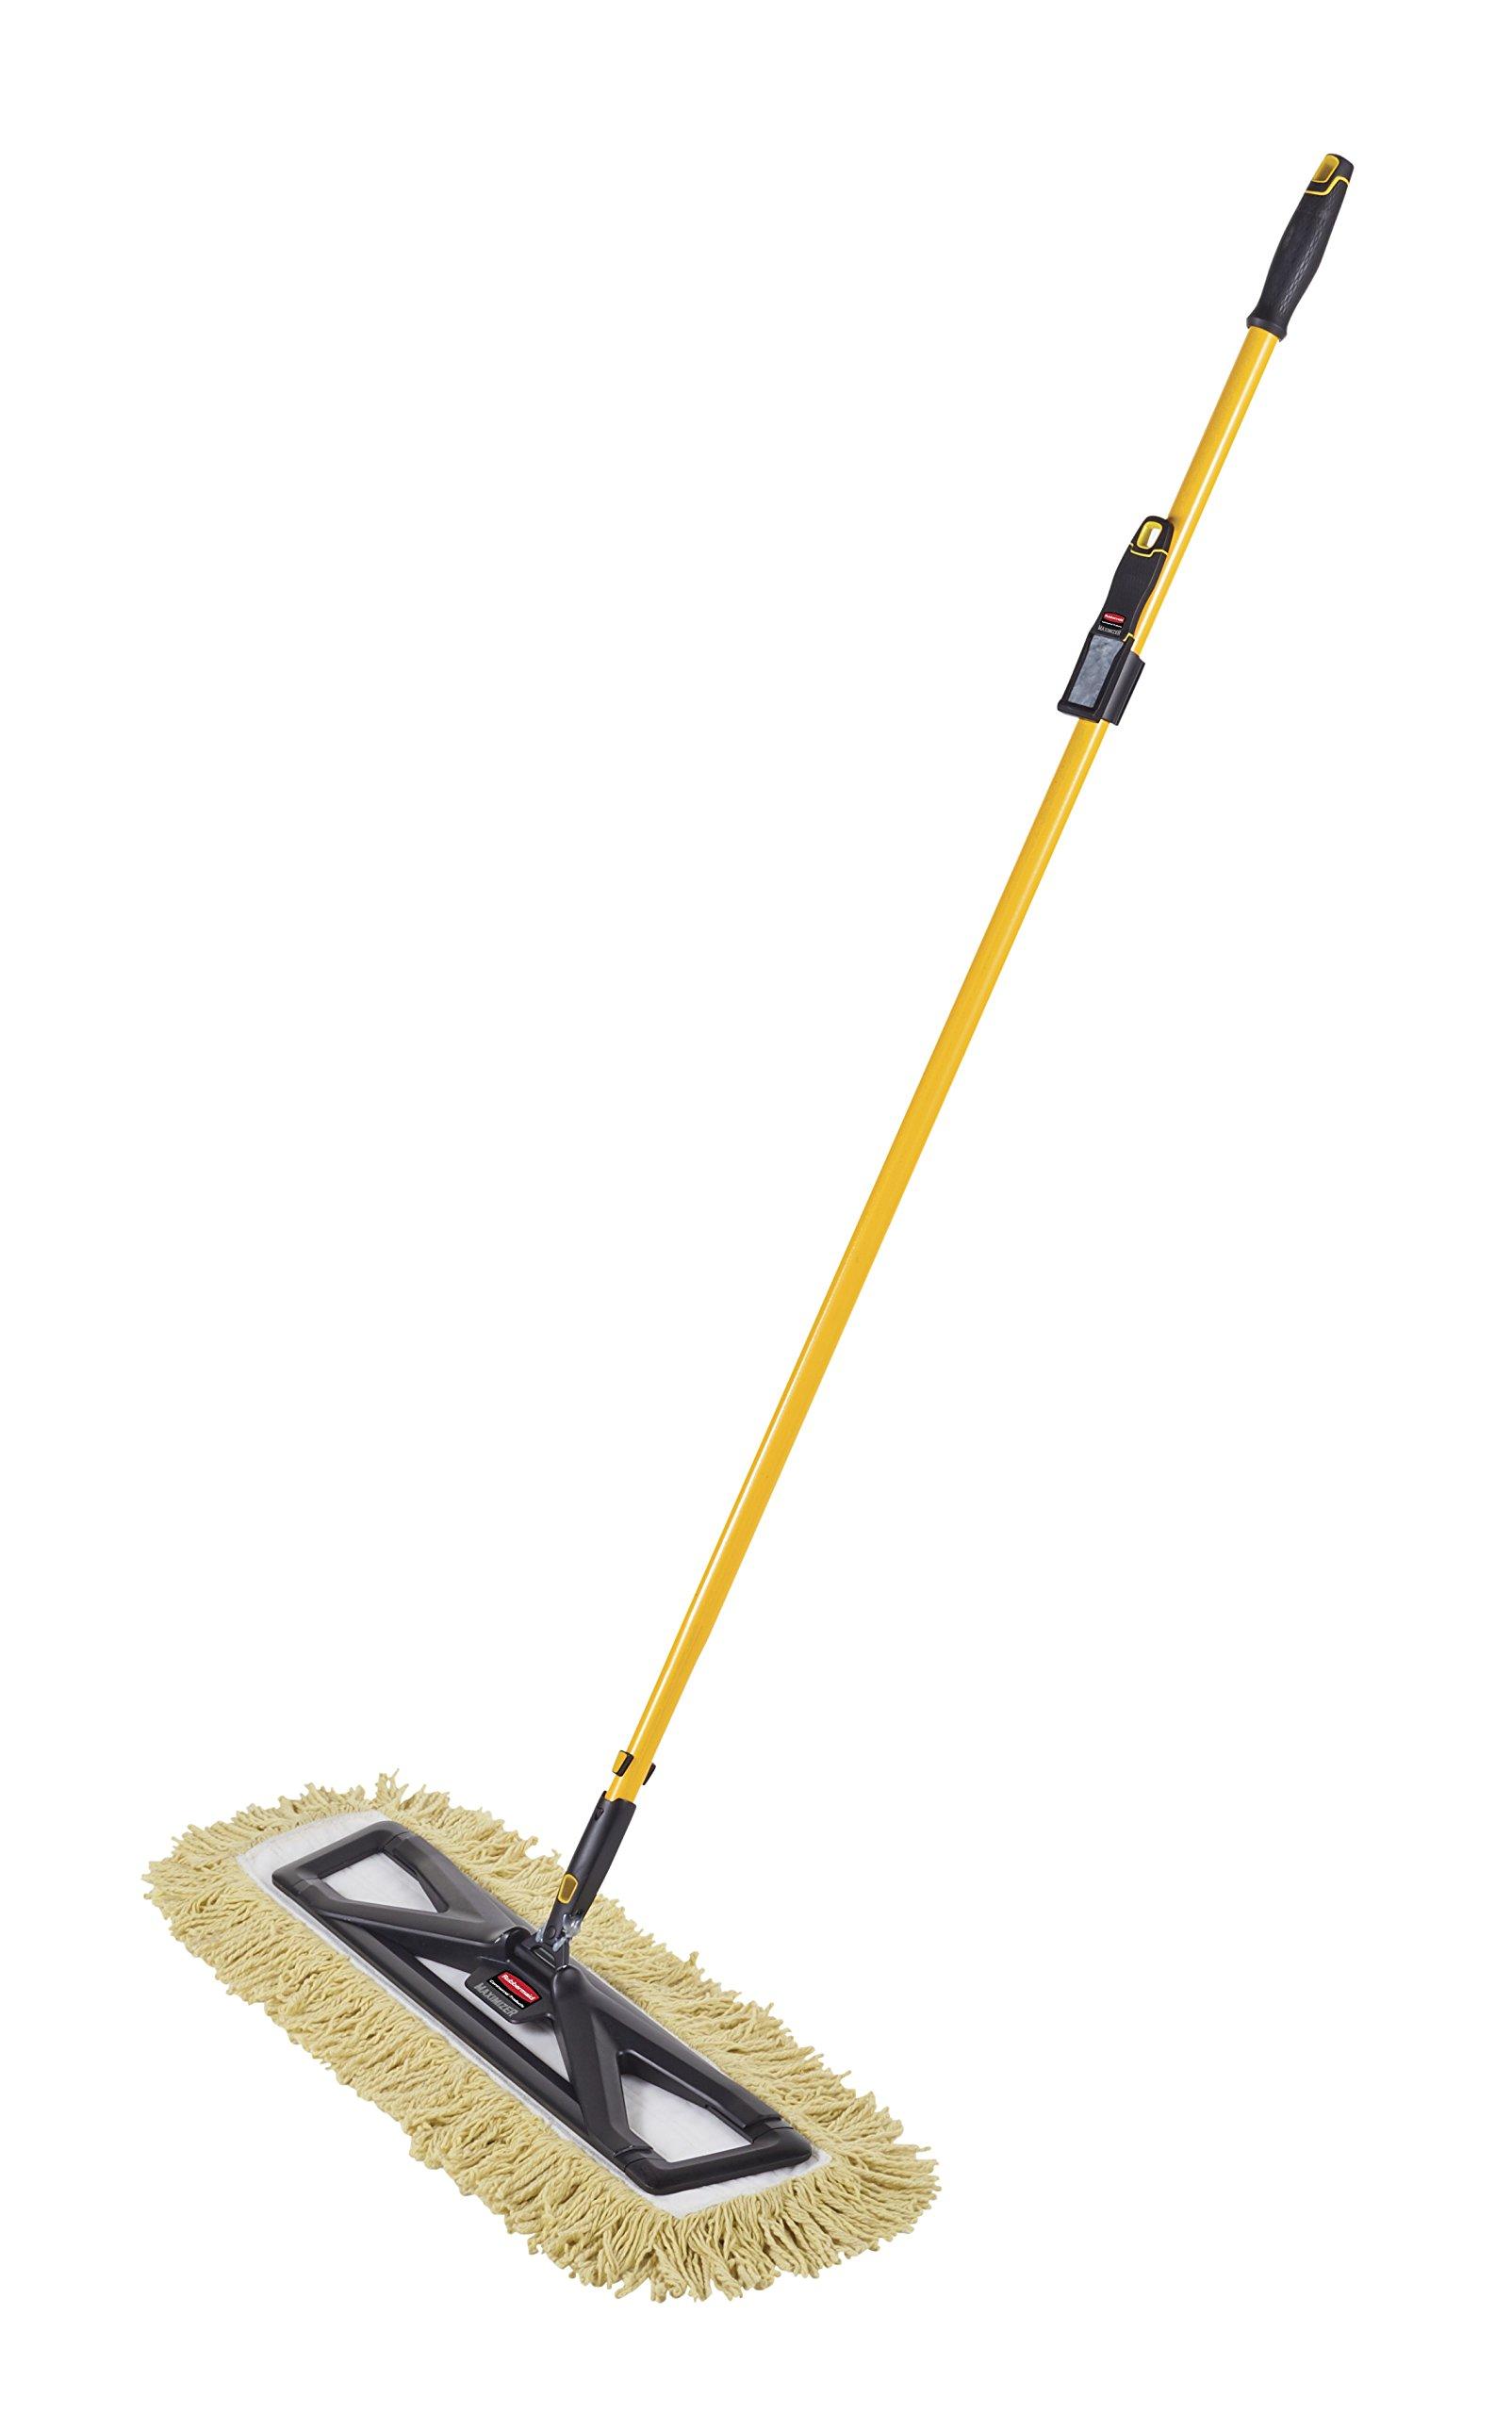 Rubbermaid Commercial Products Maximizer Dust Mop Pad and EZ Access Scraper